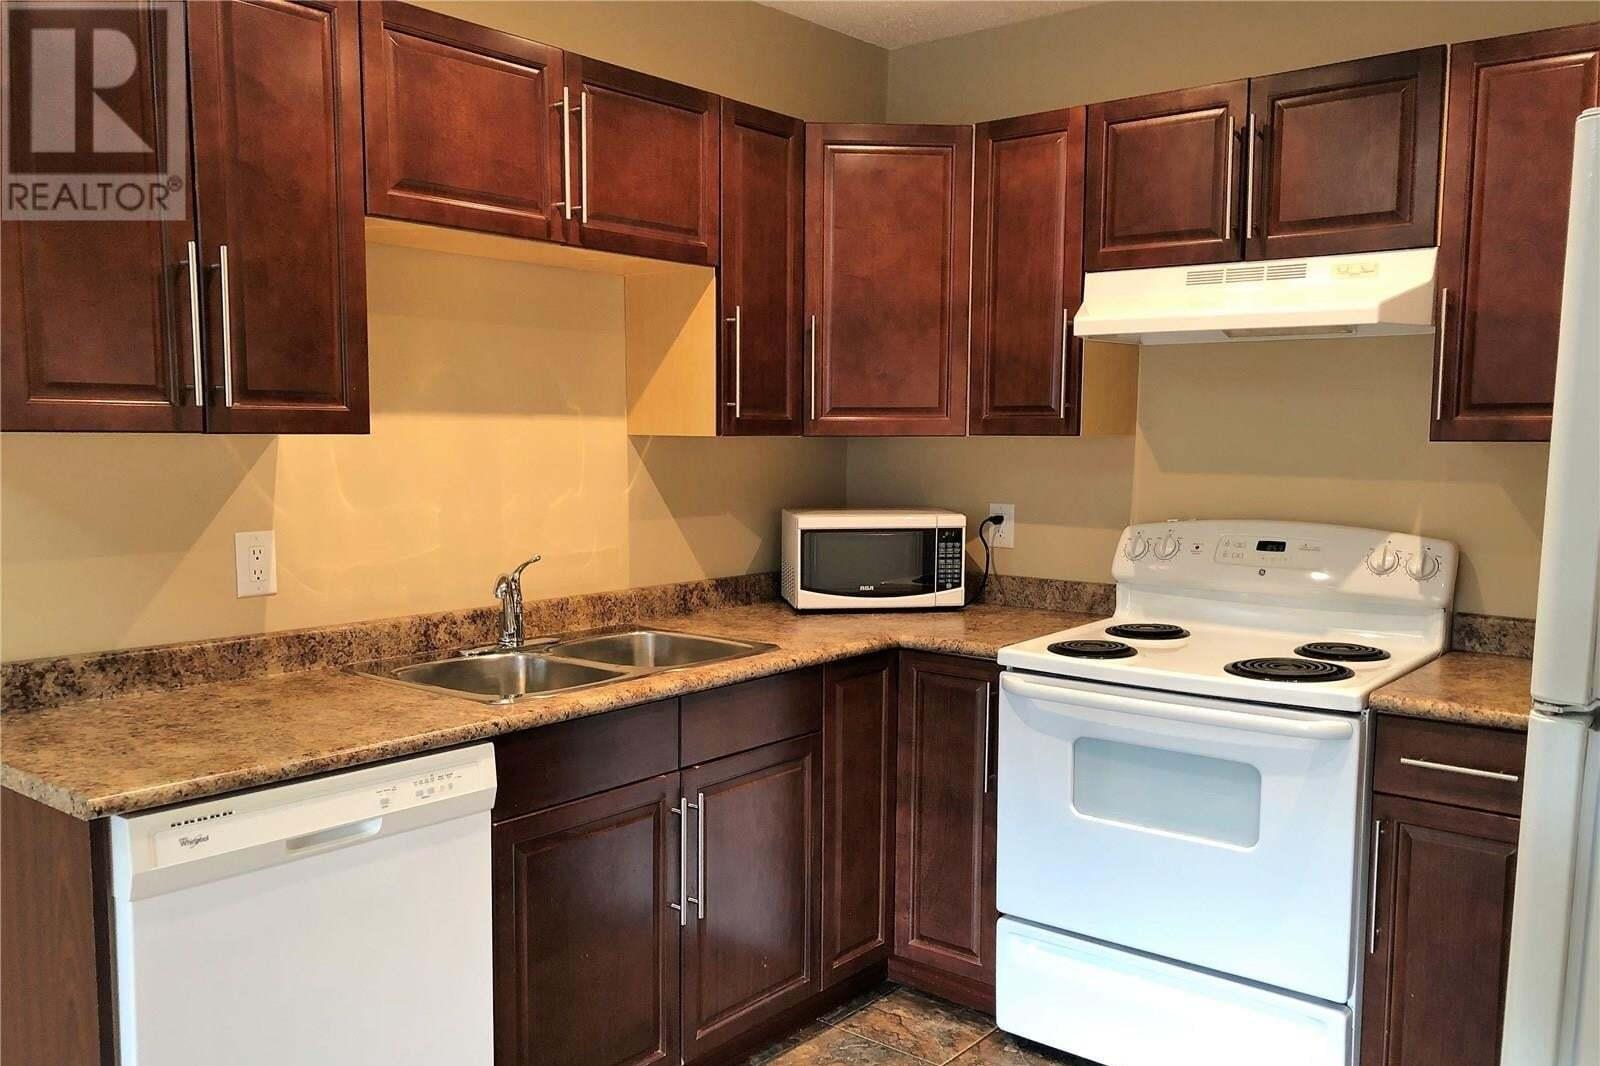 Condo for sale at 512 4th Ave N Unit 306 Saskatoon Saskatchewan - MLS: SK830291